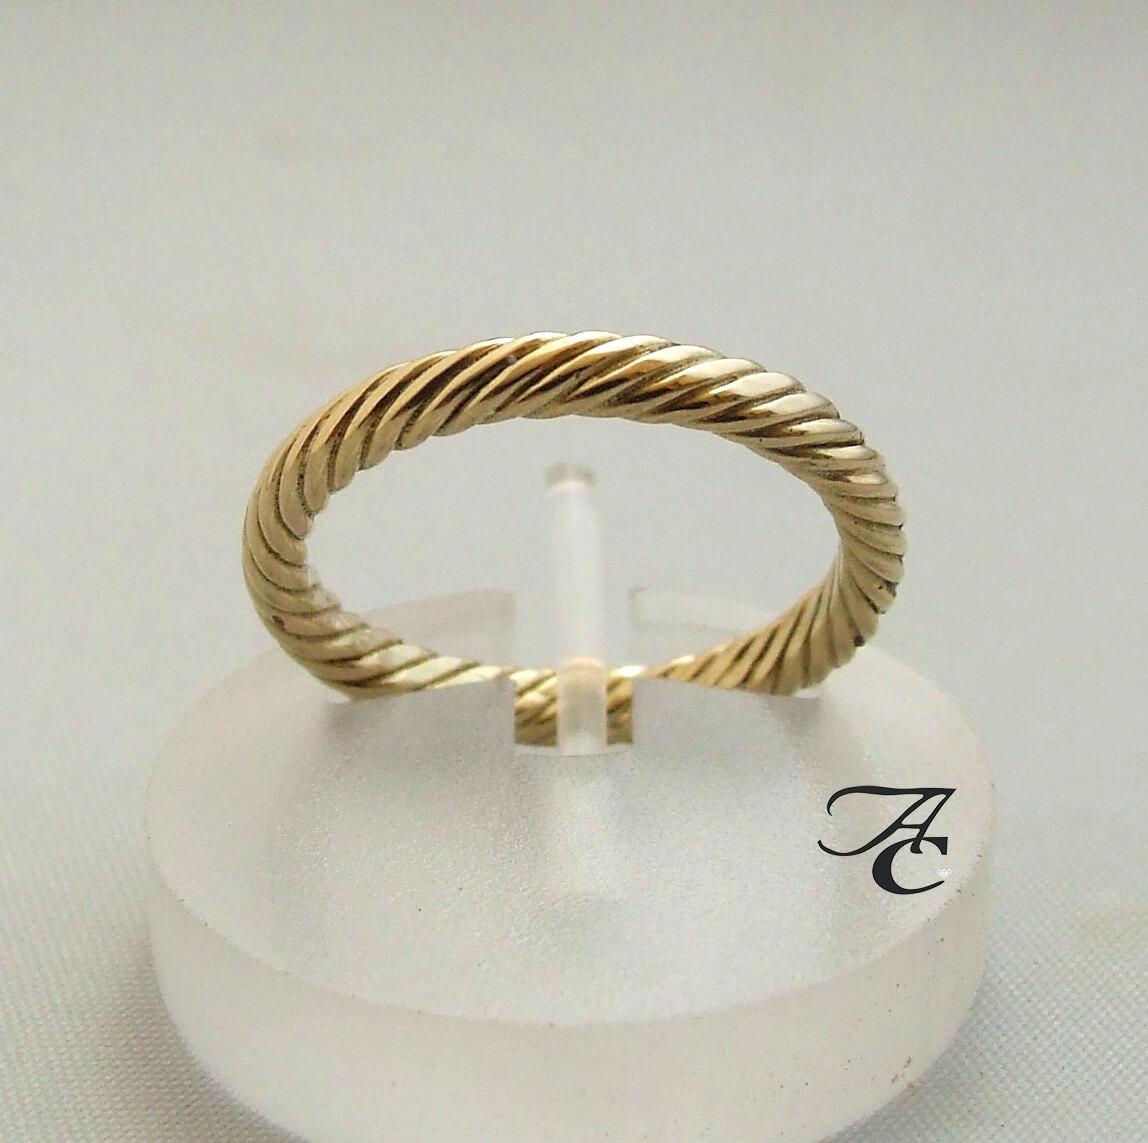 Atelier Christian geel gouden ring